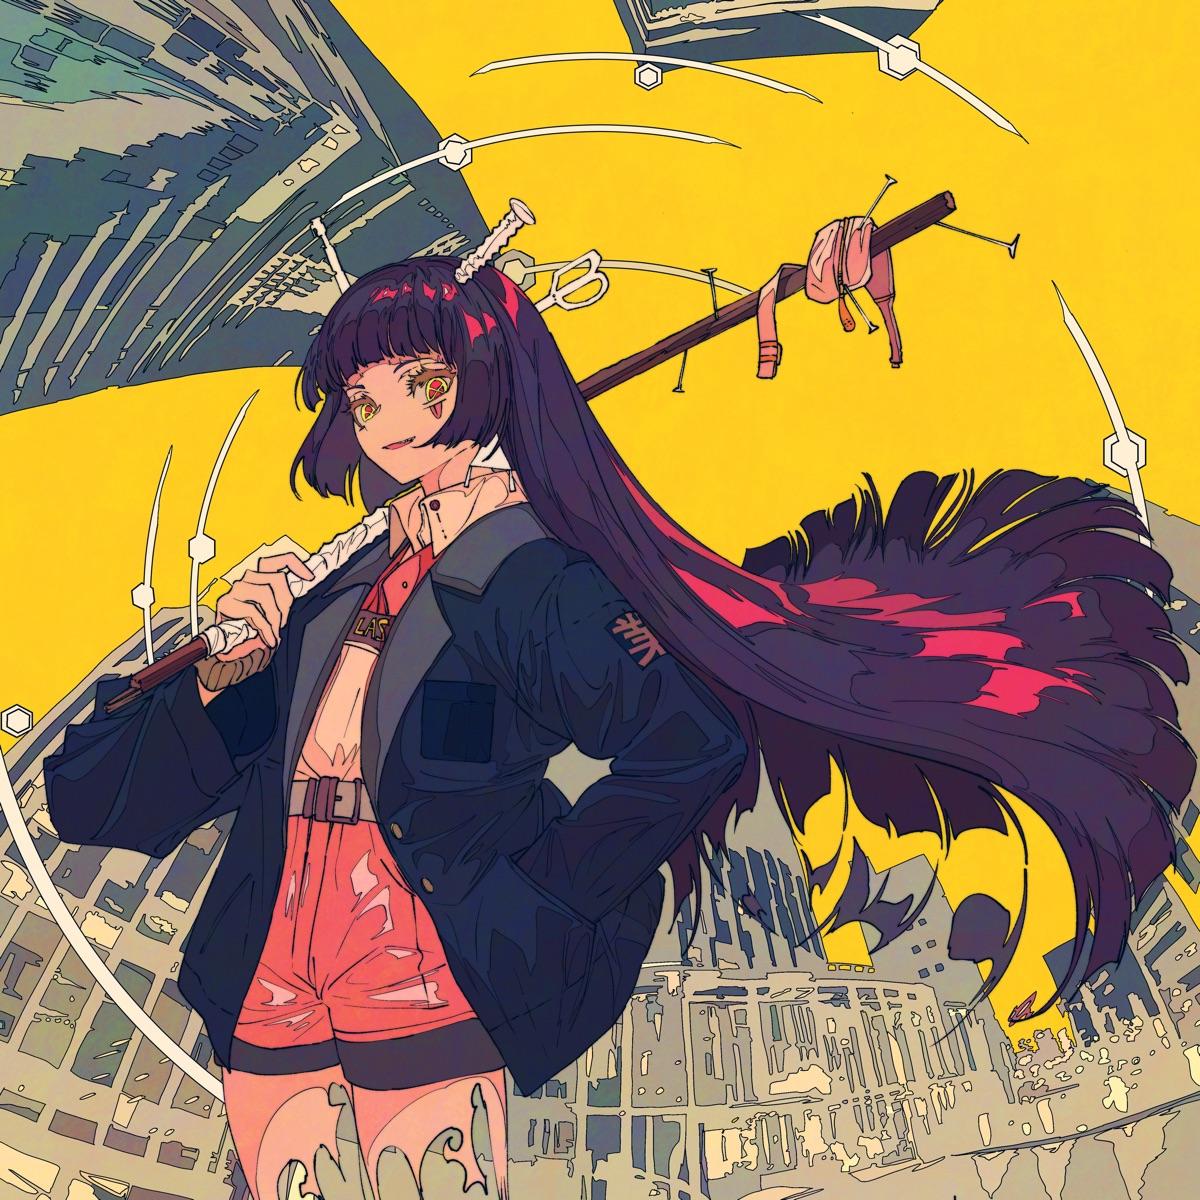 『Ayase - 夜撫でるメノウ』収録の『幽霊東京』ジャケット